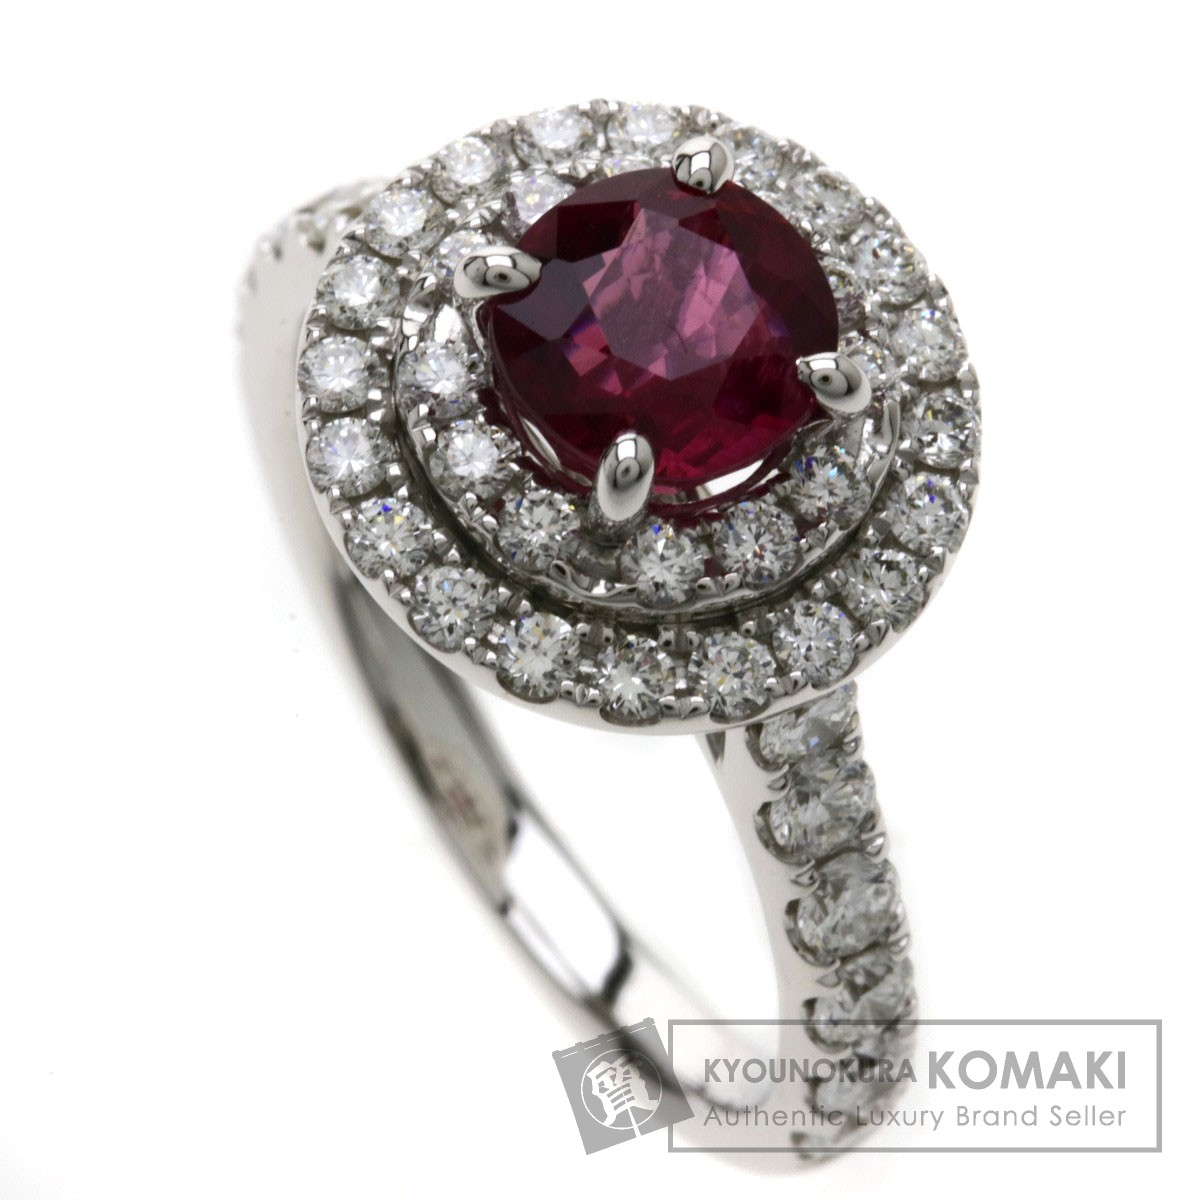 1.486ct ルビー/ダイヤモンド リング・指輪 K18WG 5.1g レディース 【中古】